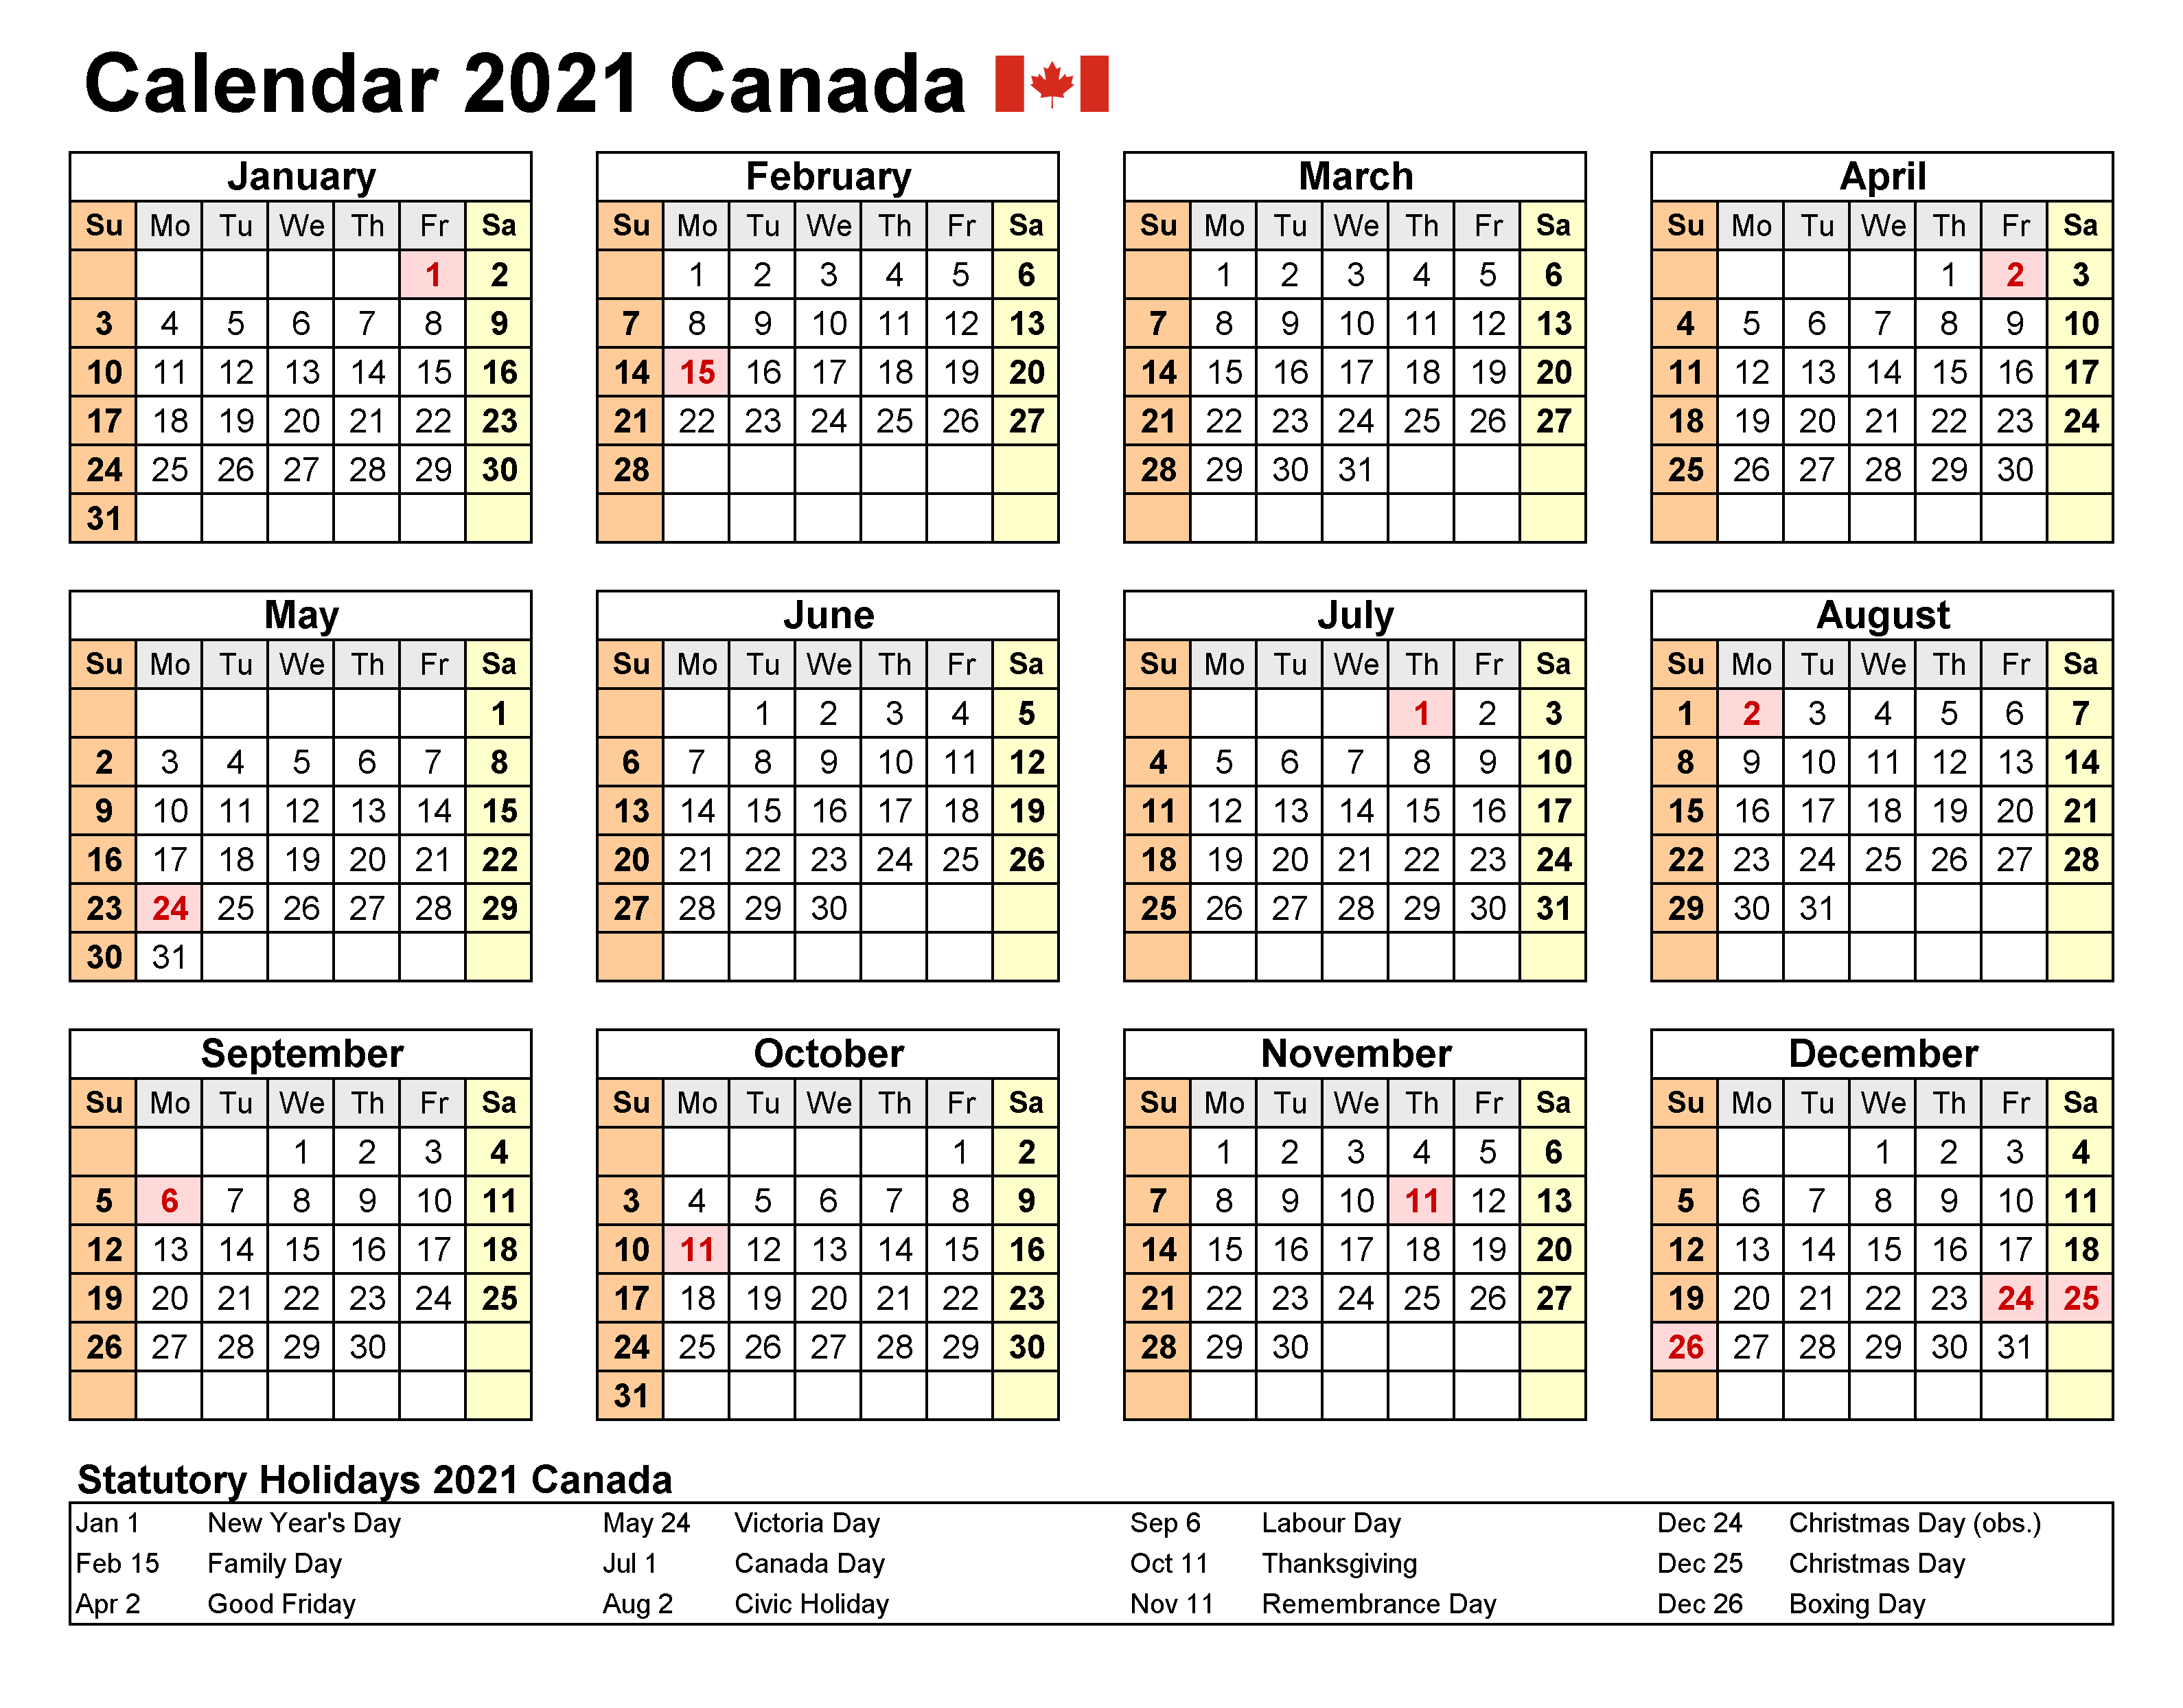 Canada Calendar 2021 with Holidays